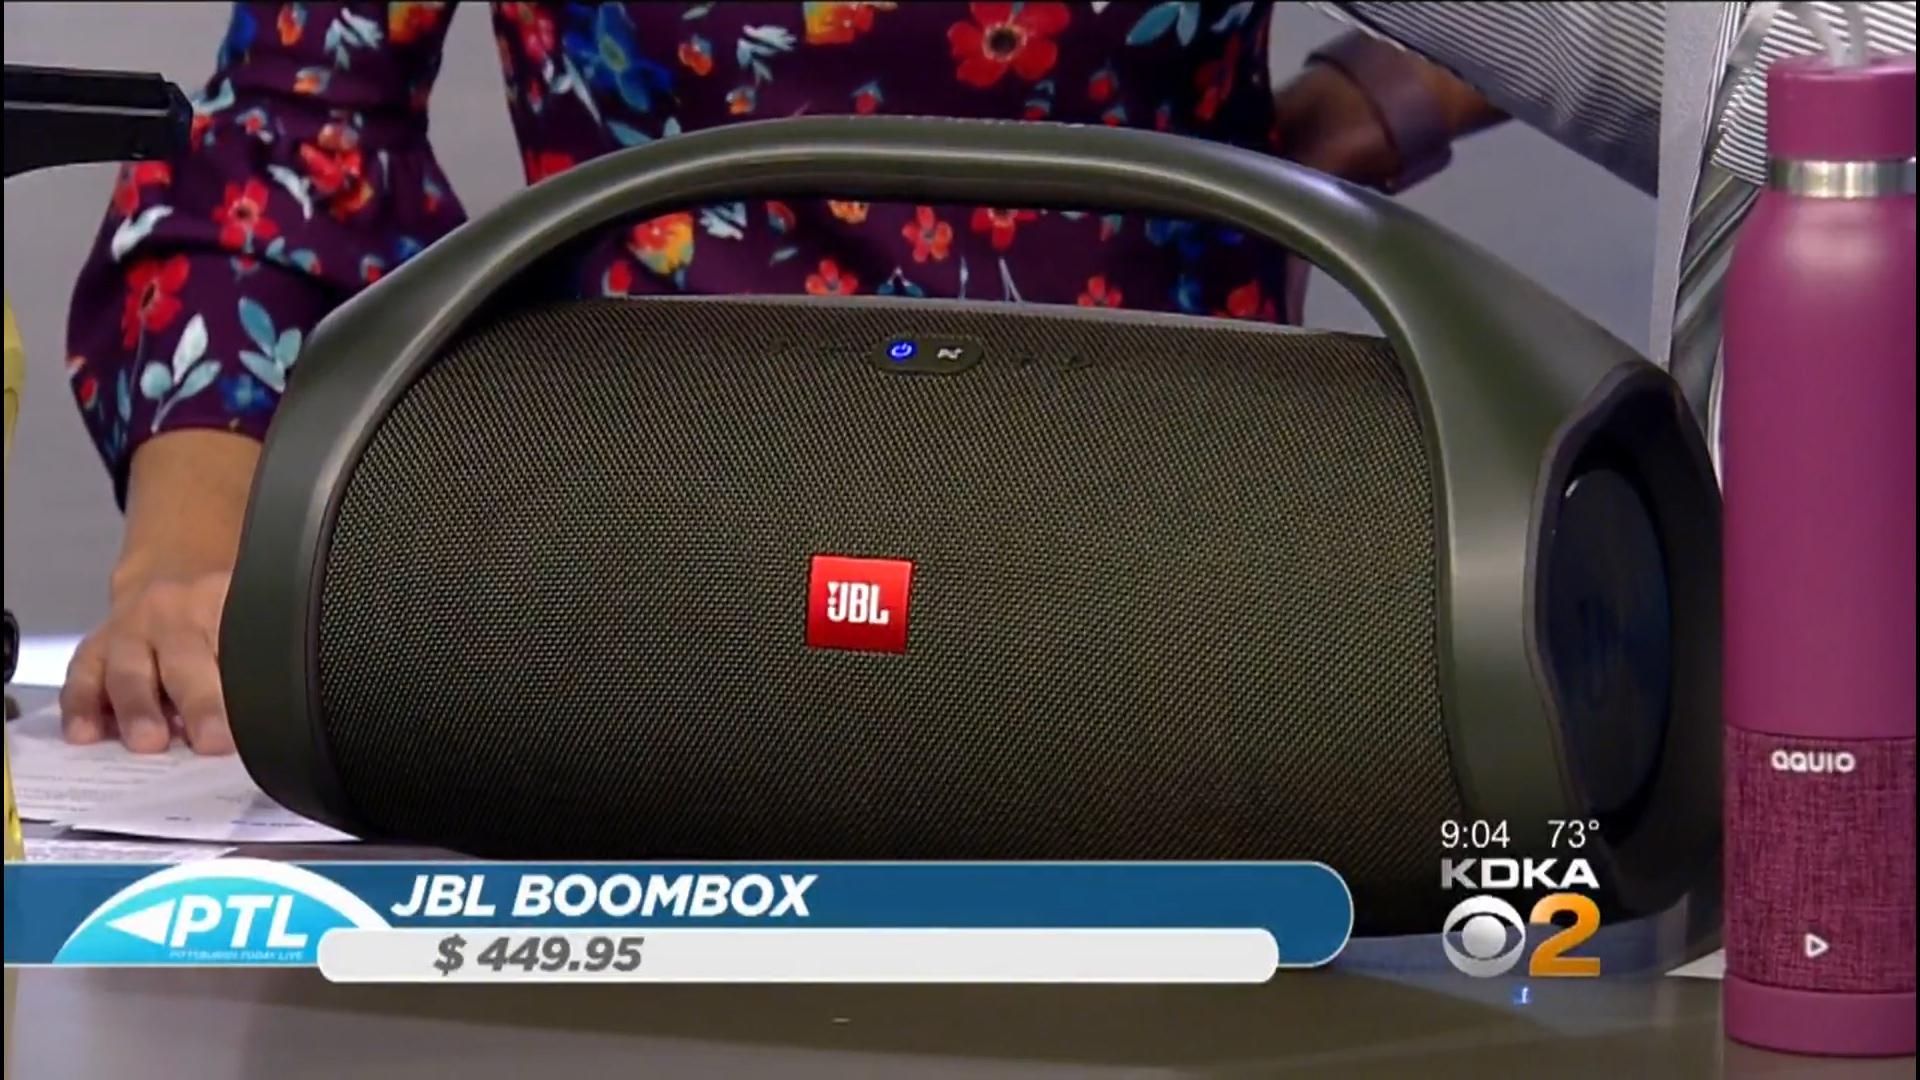 JBL BOOMBOX - $449.95Shop Now